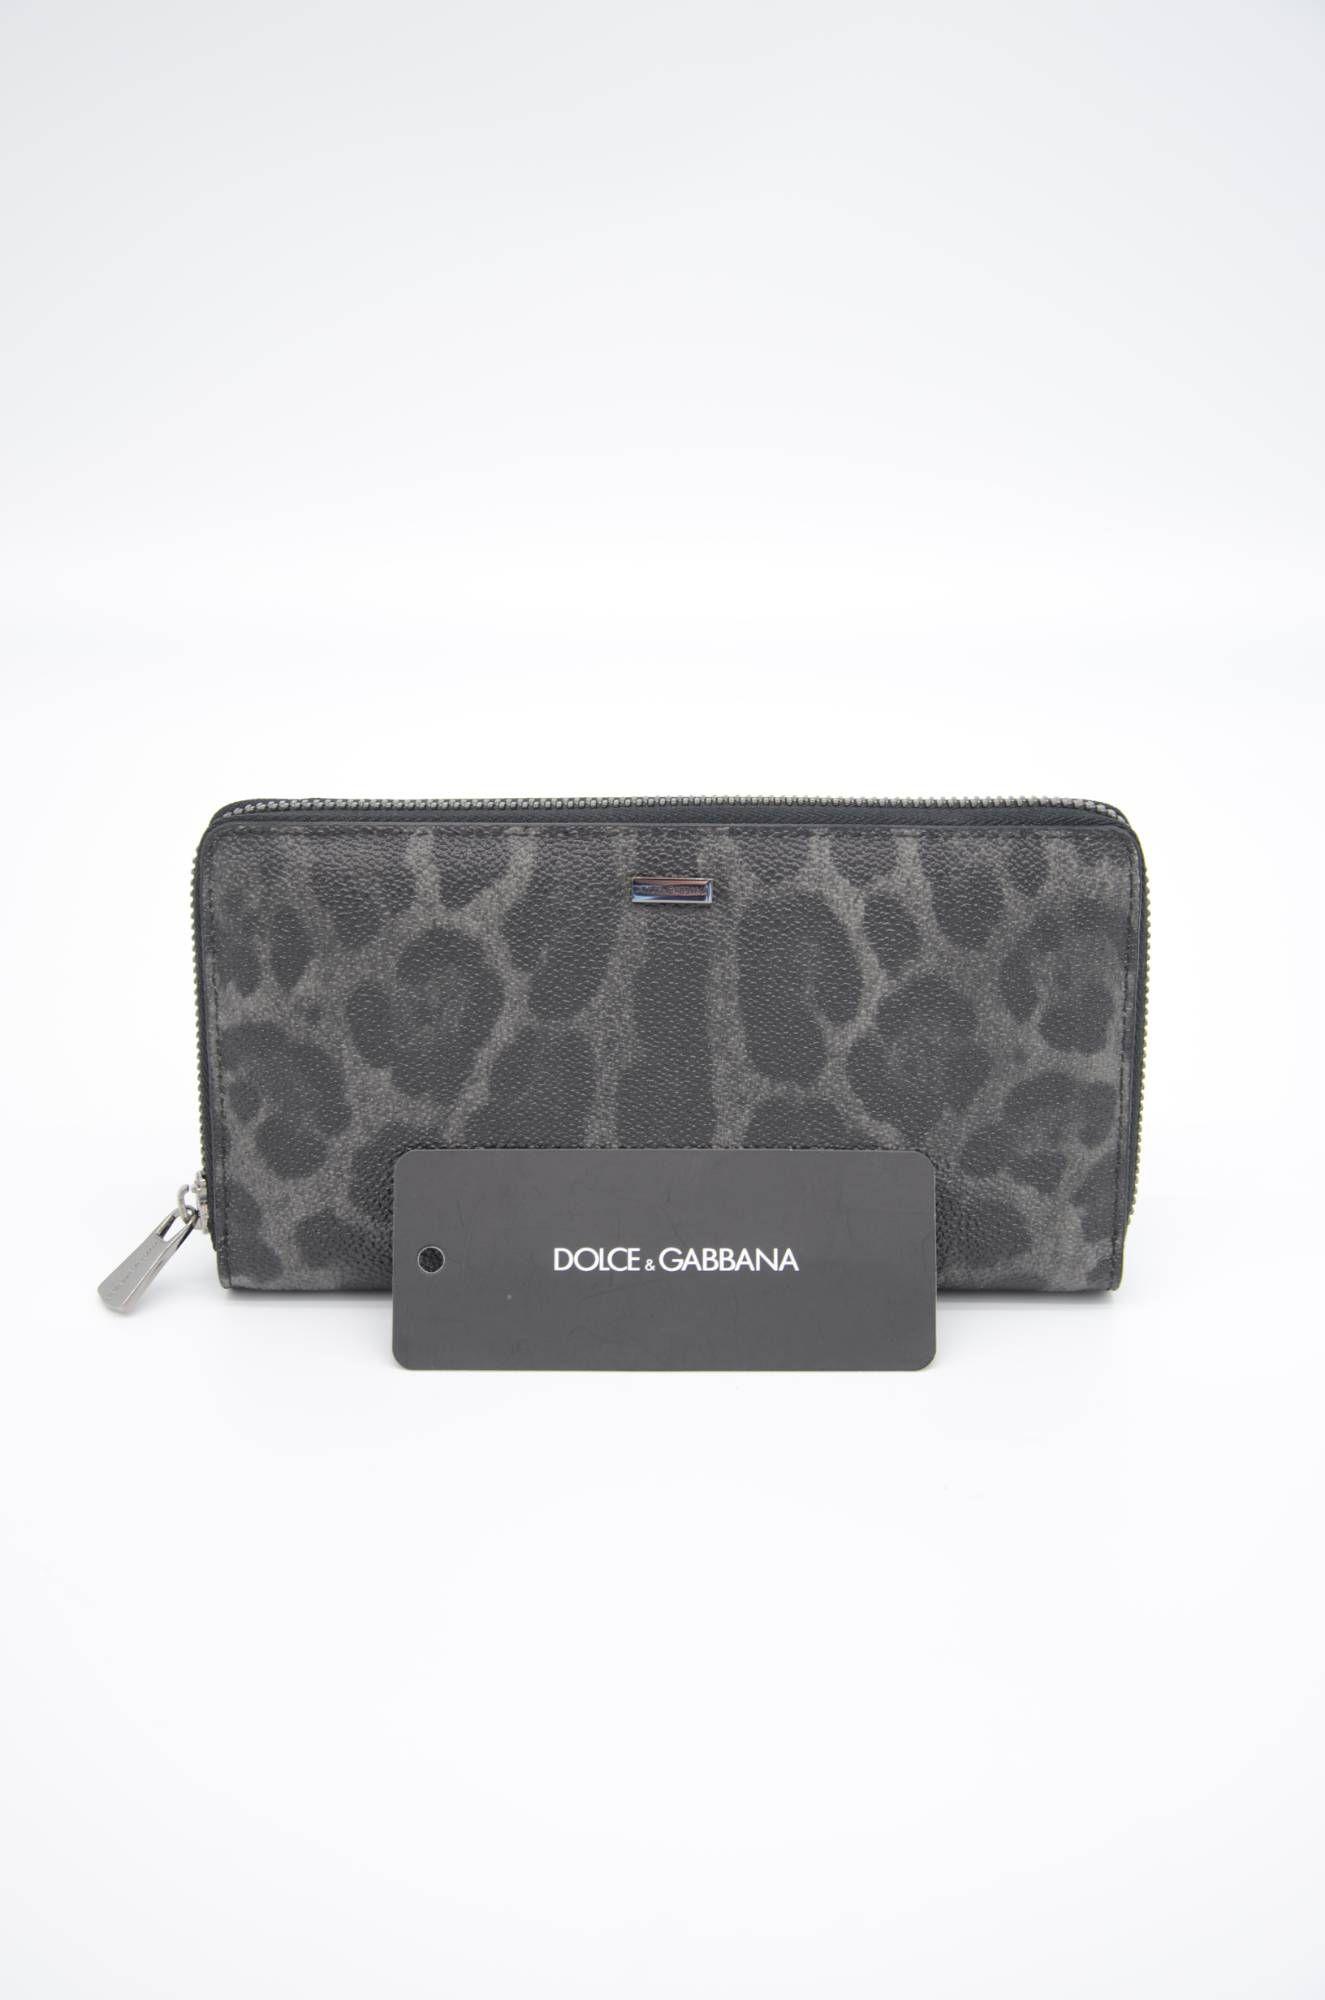 Dolce & Gabbana Men Leather Wallet